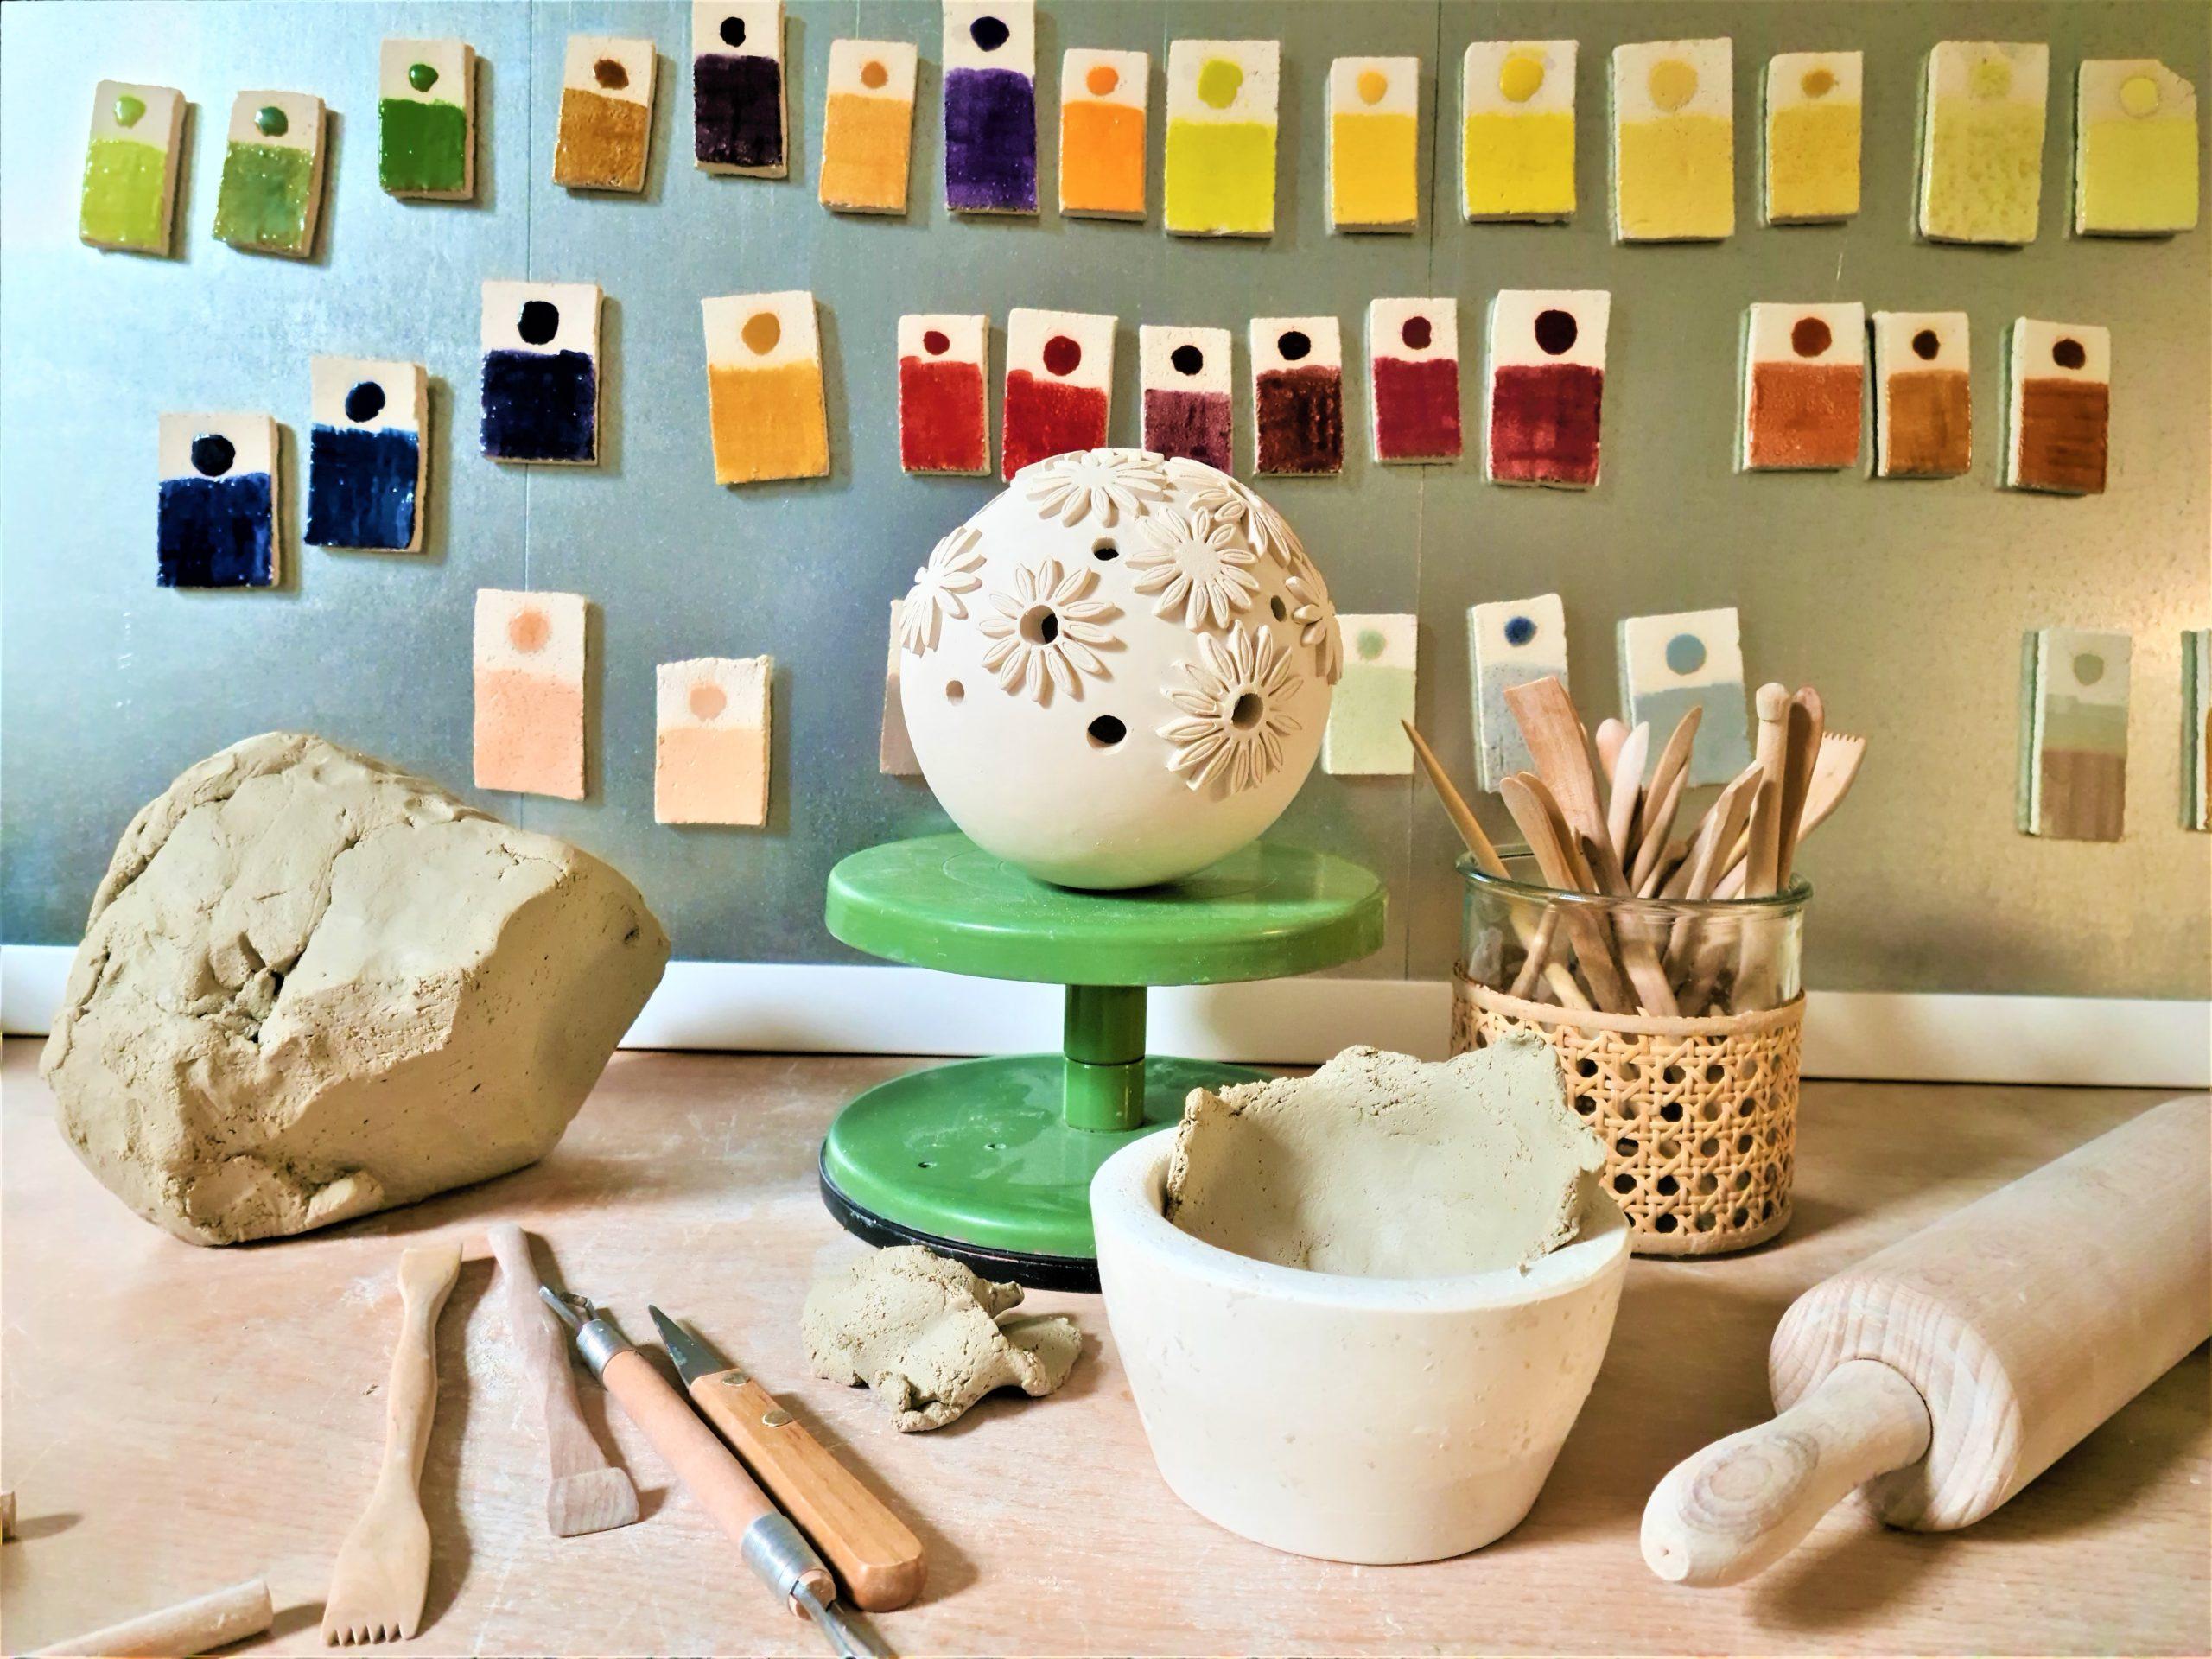 Sabine Haugg Keramikkunst, Atelier am Stadtpark